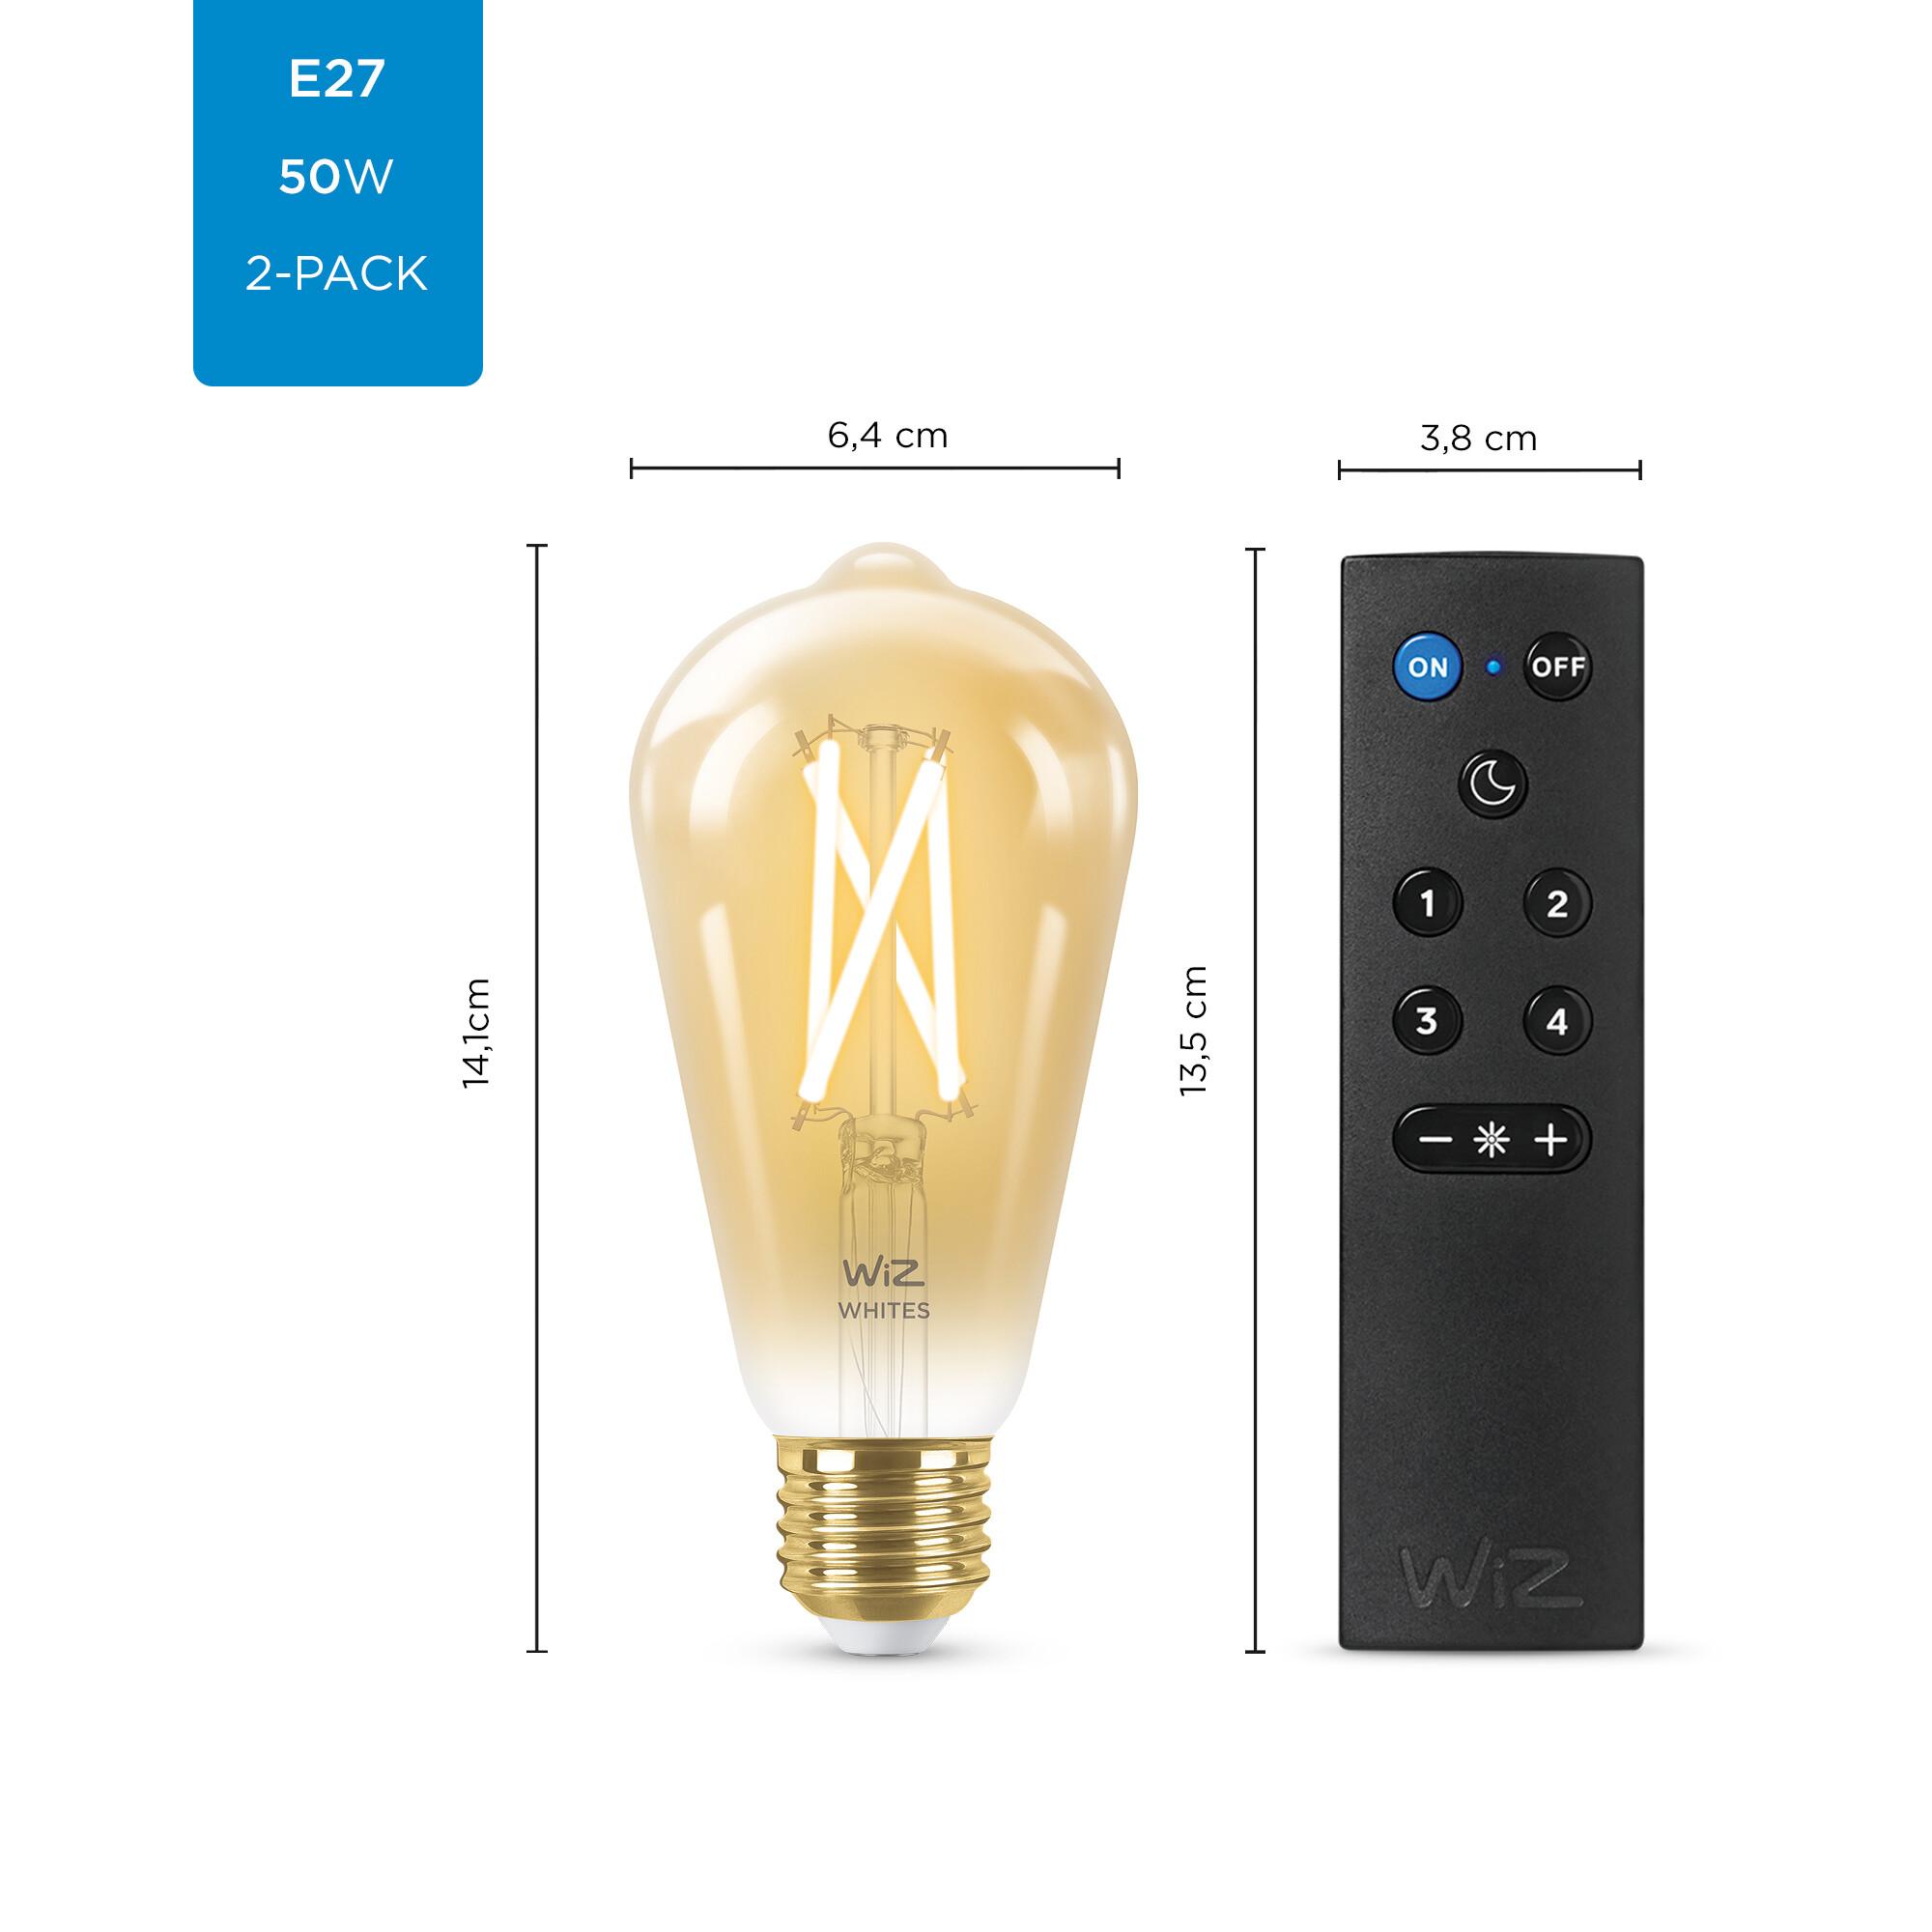 WiZ E27 50W 640lm 2000K Edison Gouden coating